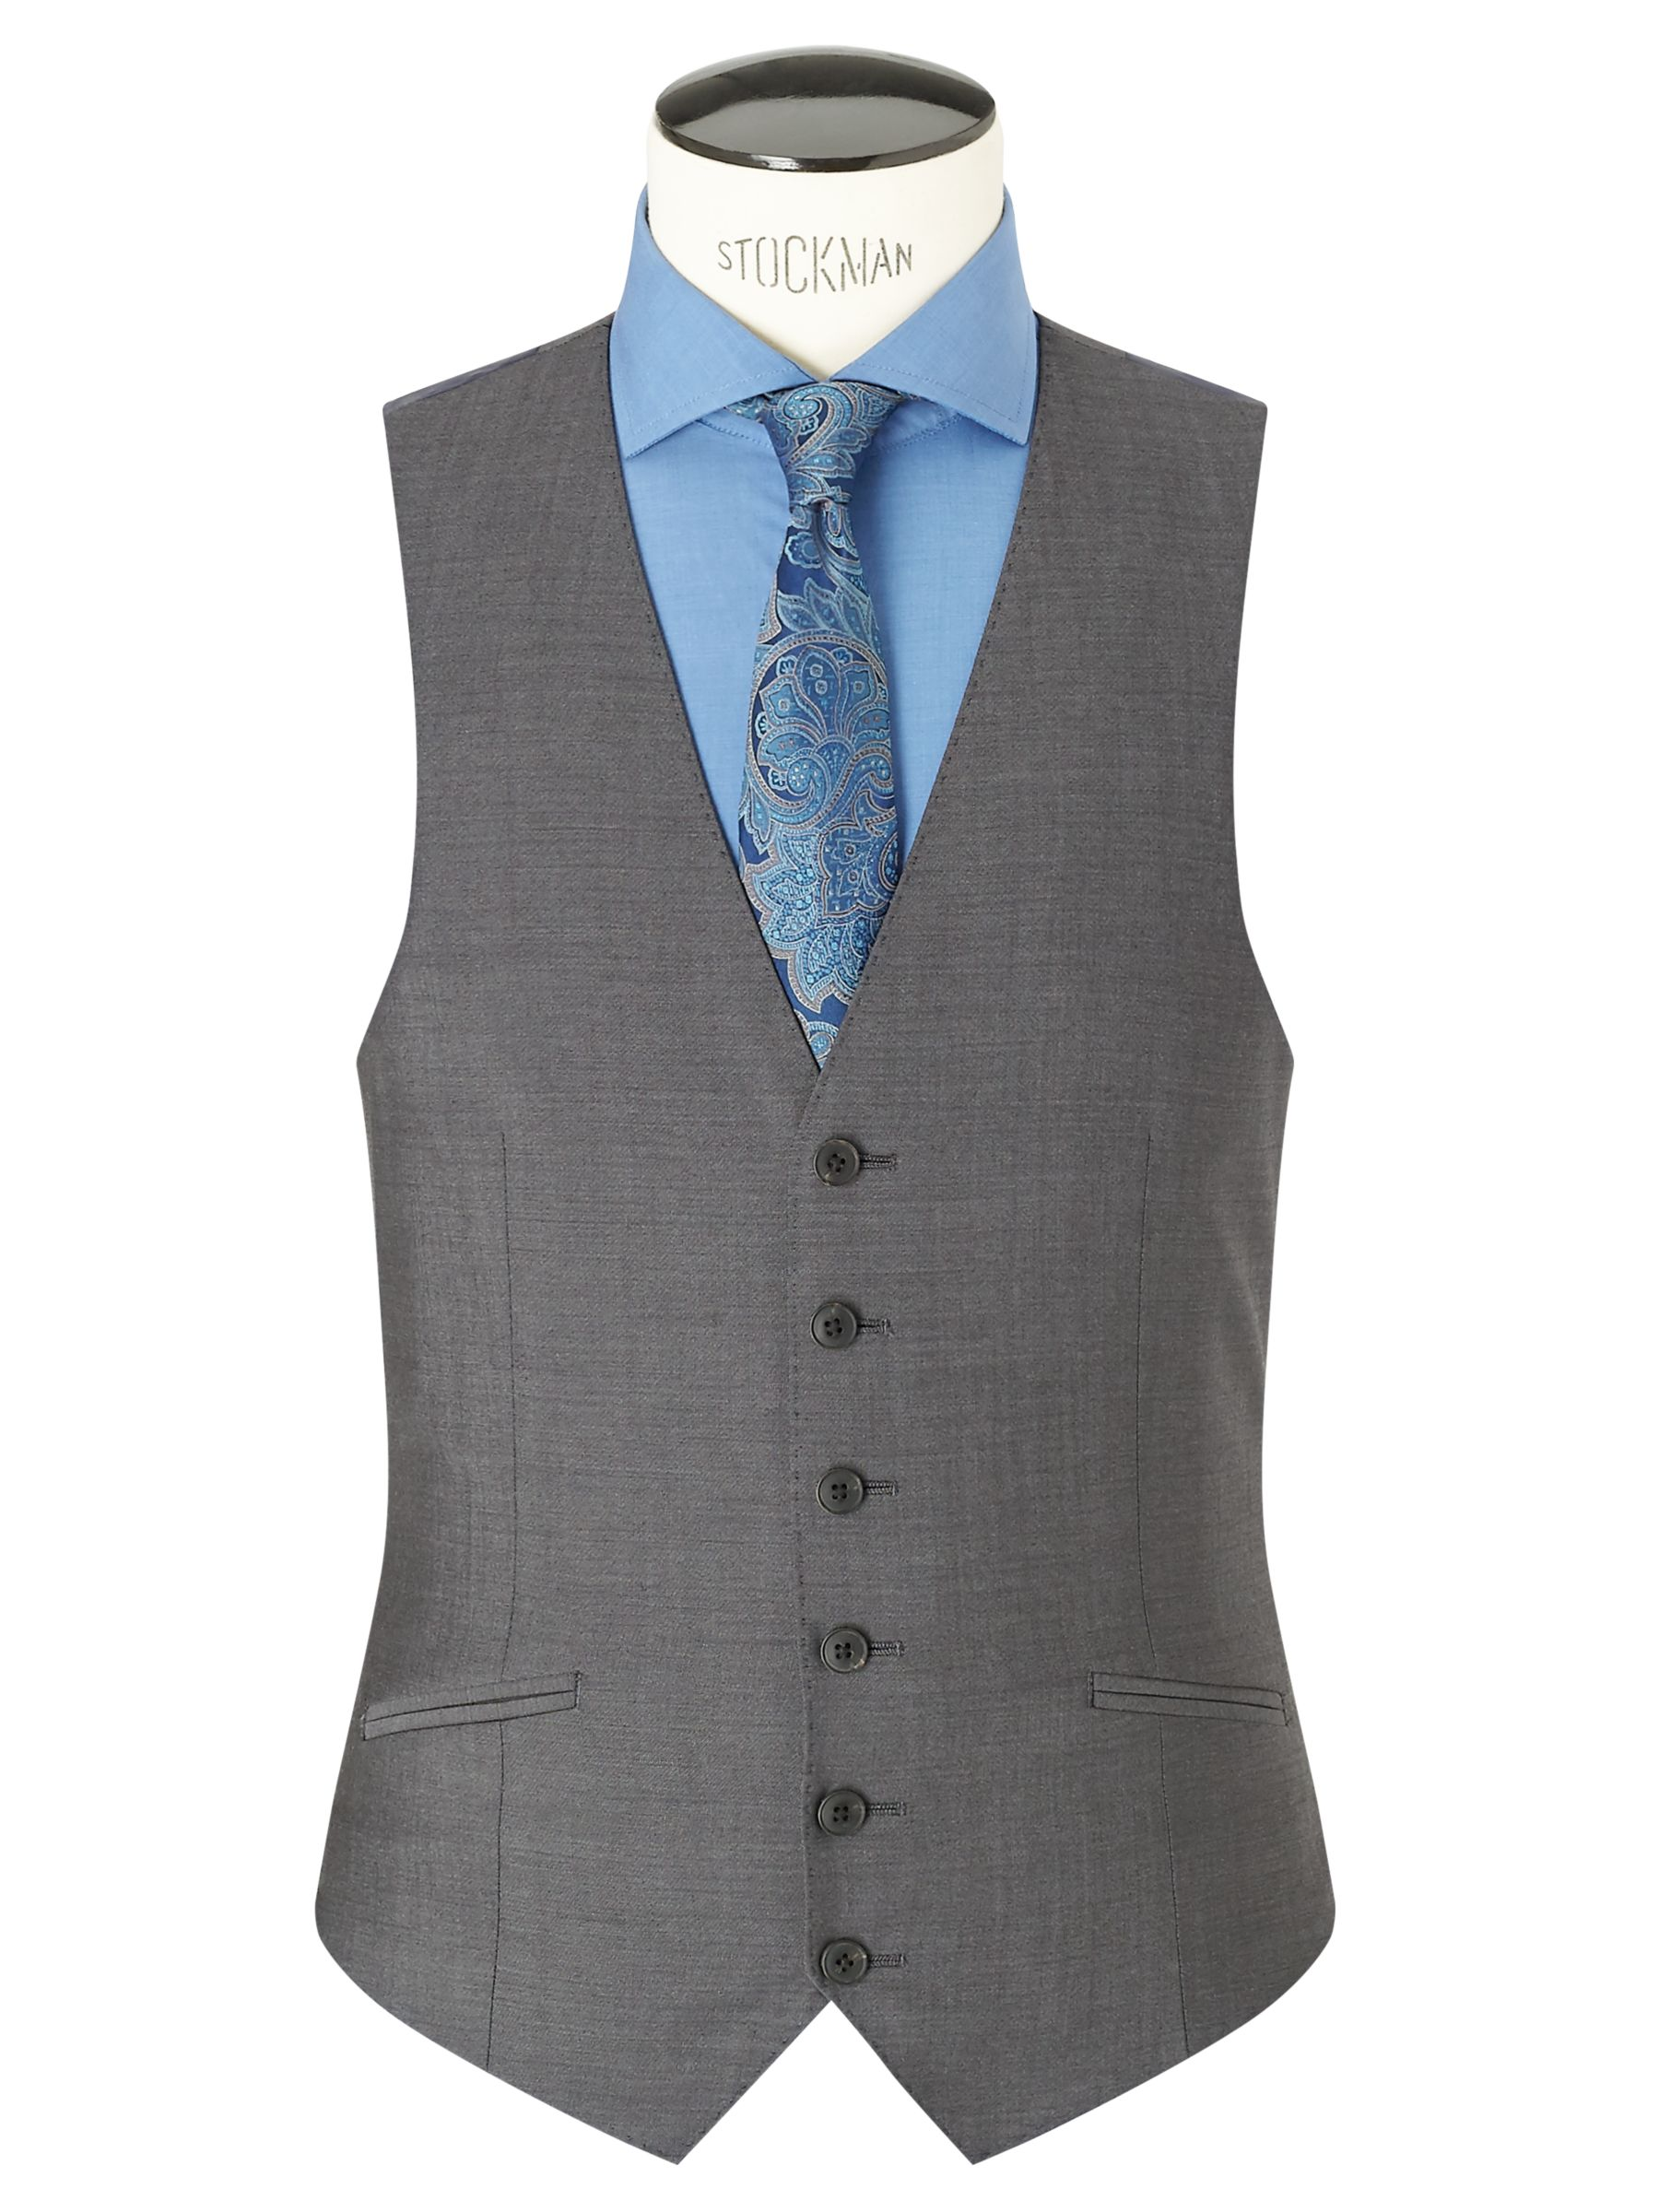 Richard James Mayfair Richard James Mayfair Tonic Sheen Slim Waistcoat, Charcoal